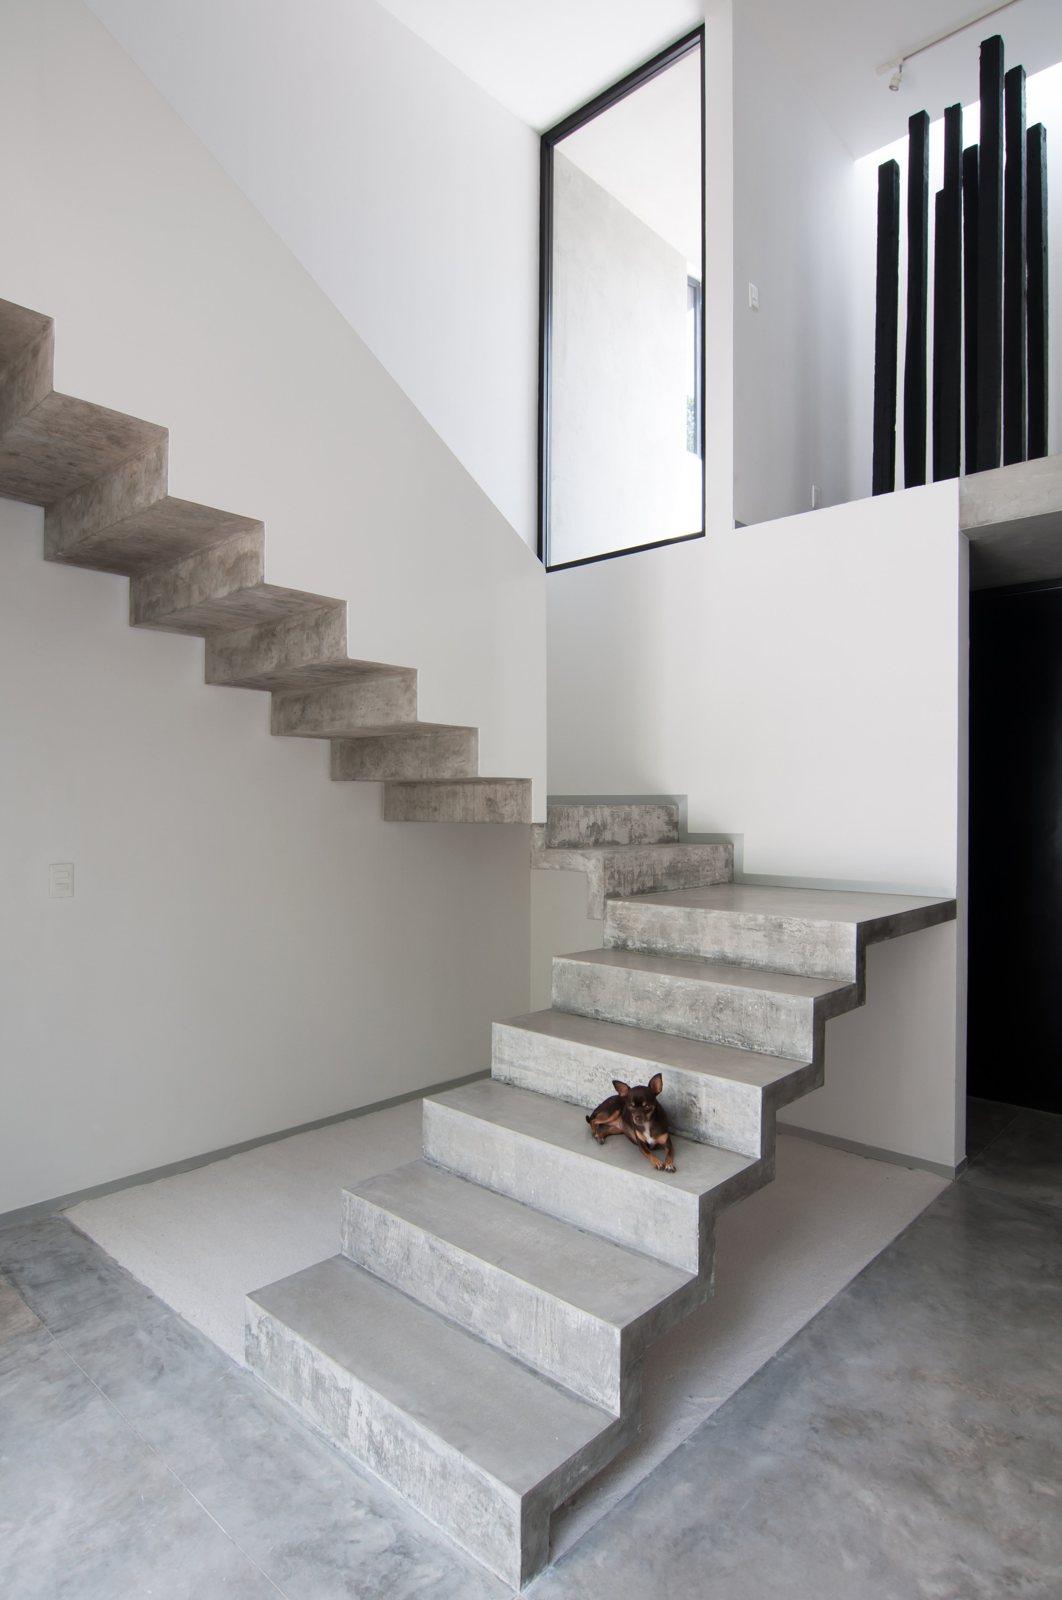 Attirant U Shaped Concrete Staircase Casa Garcias By Warm Architects